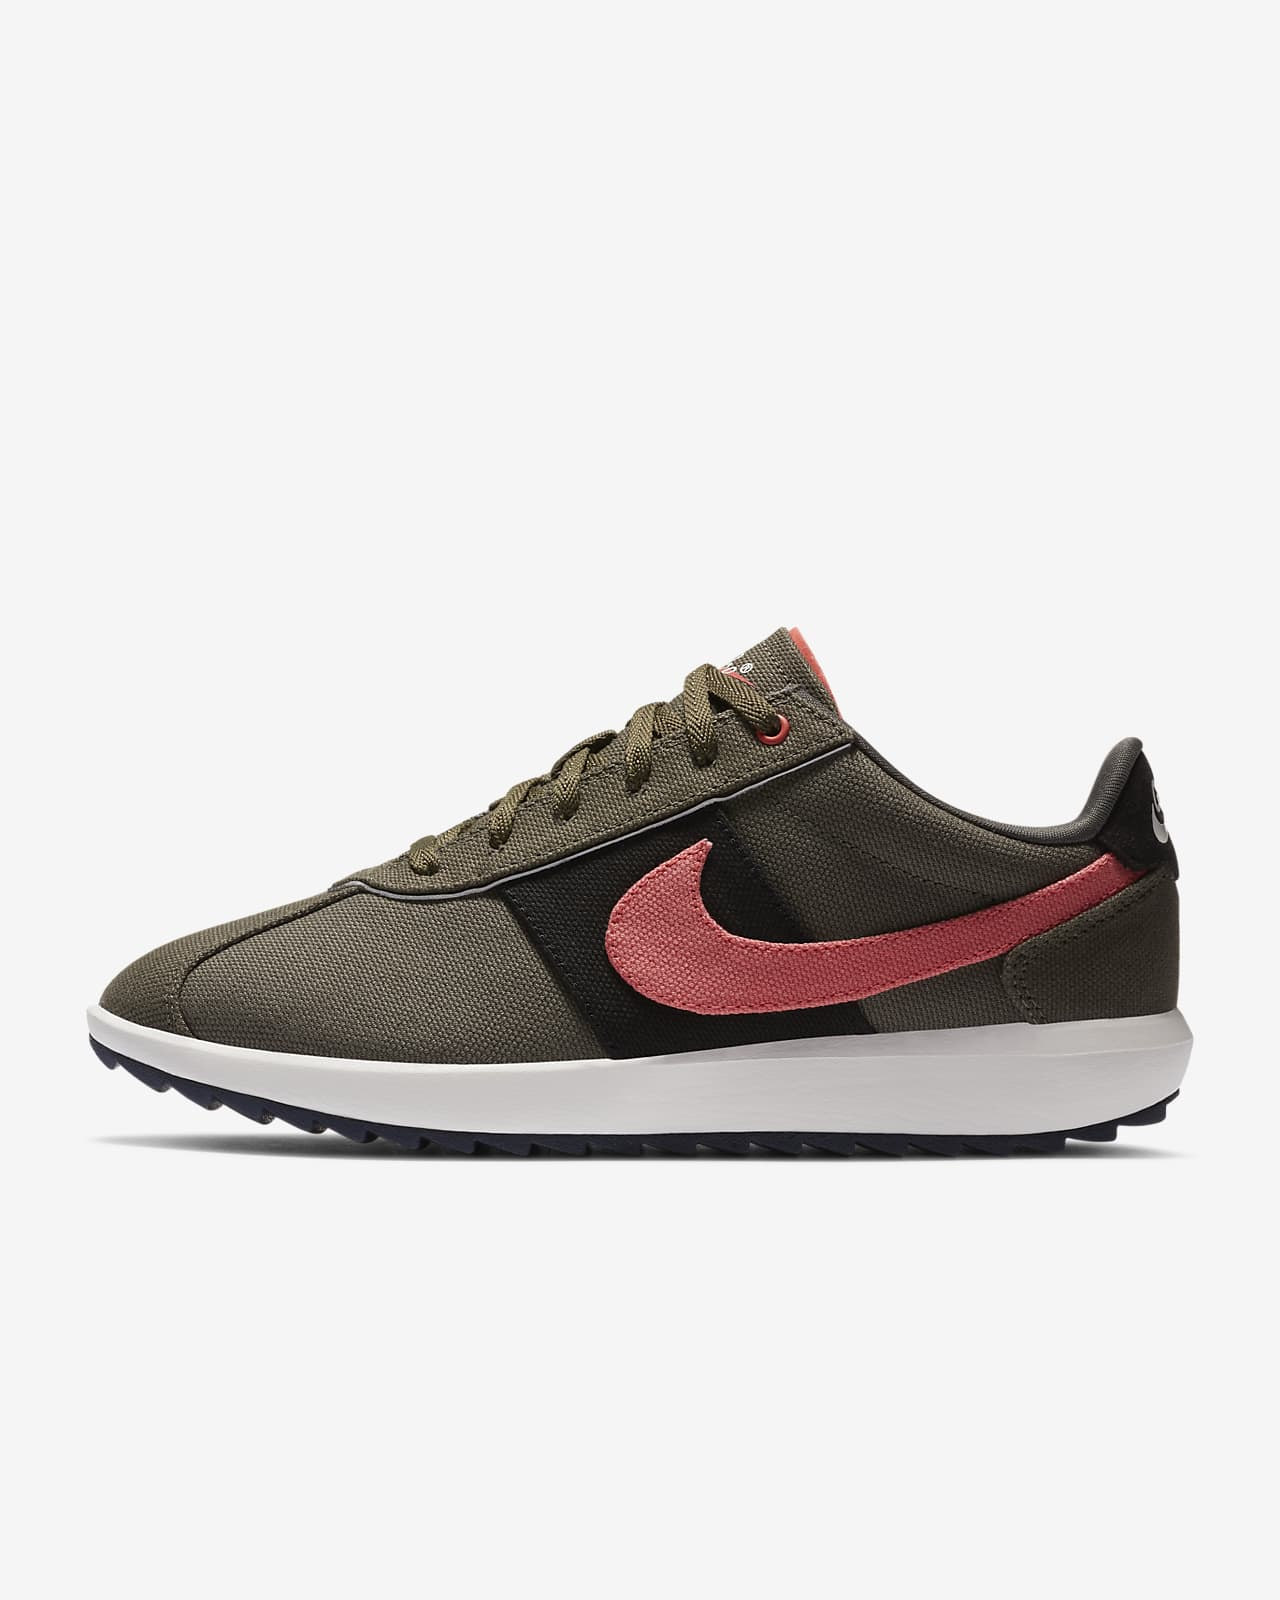 Nike Cortez G NRG Zapatillas de golf - Mujer